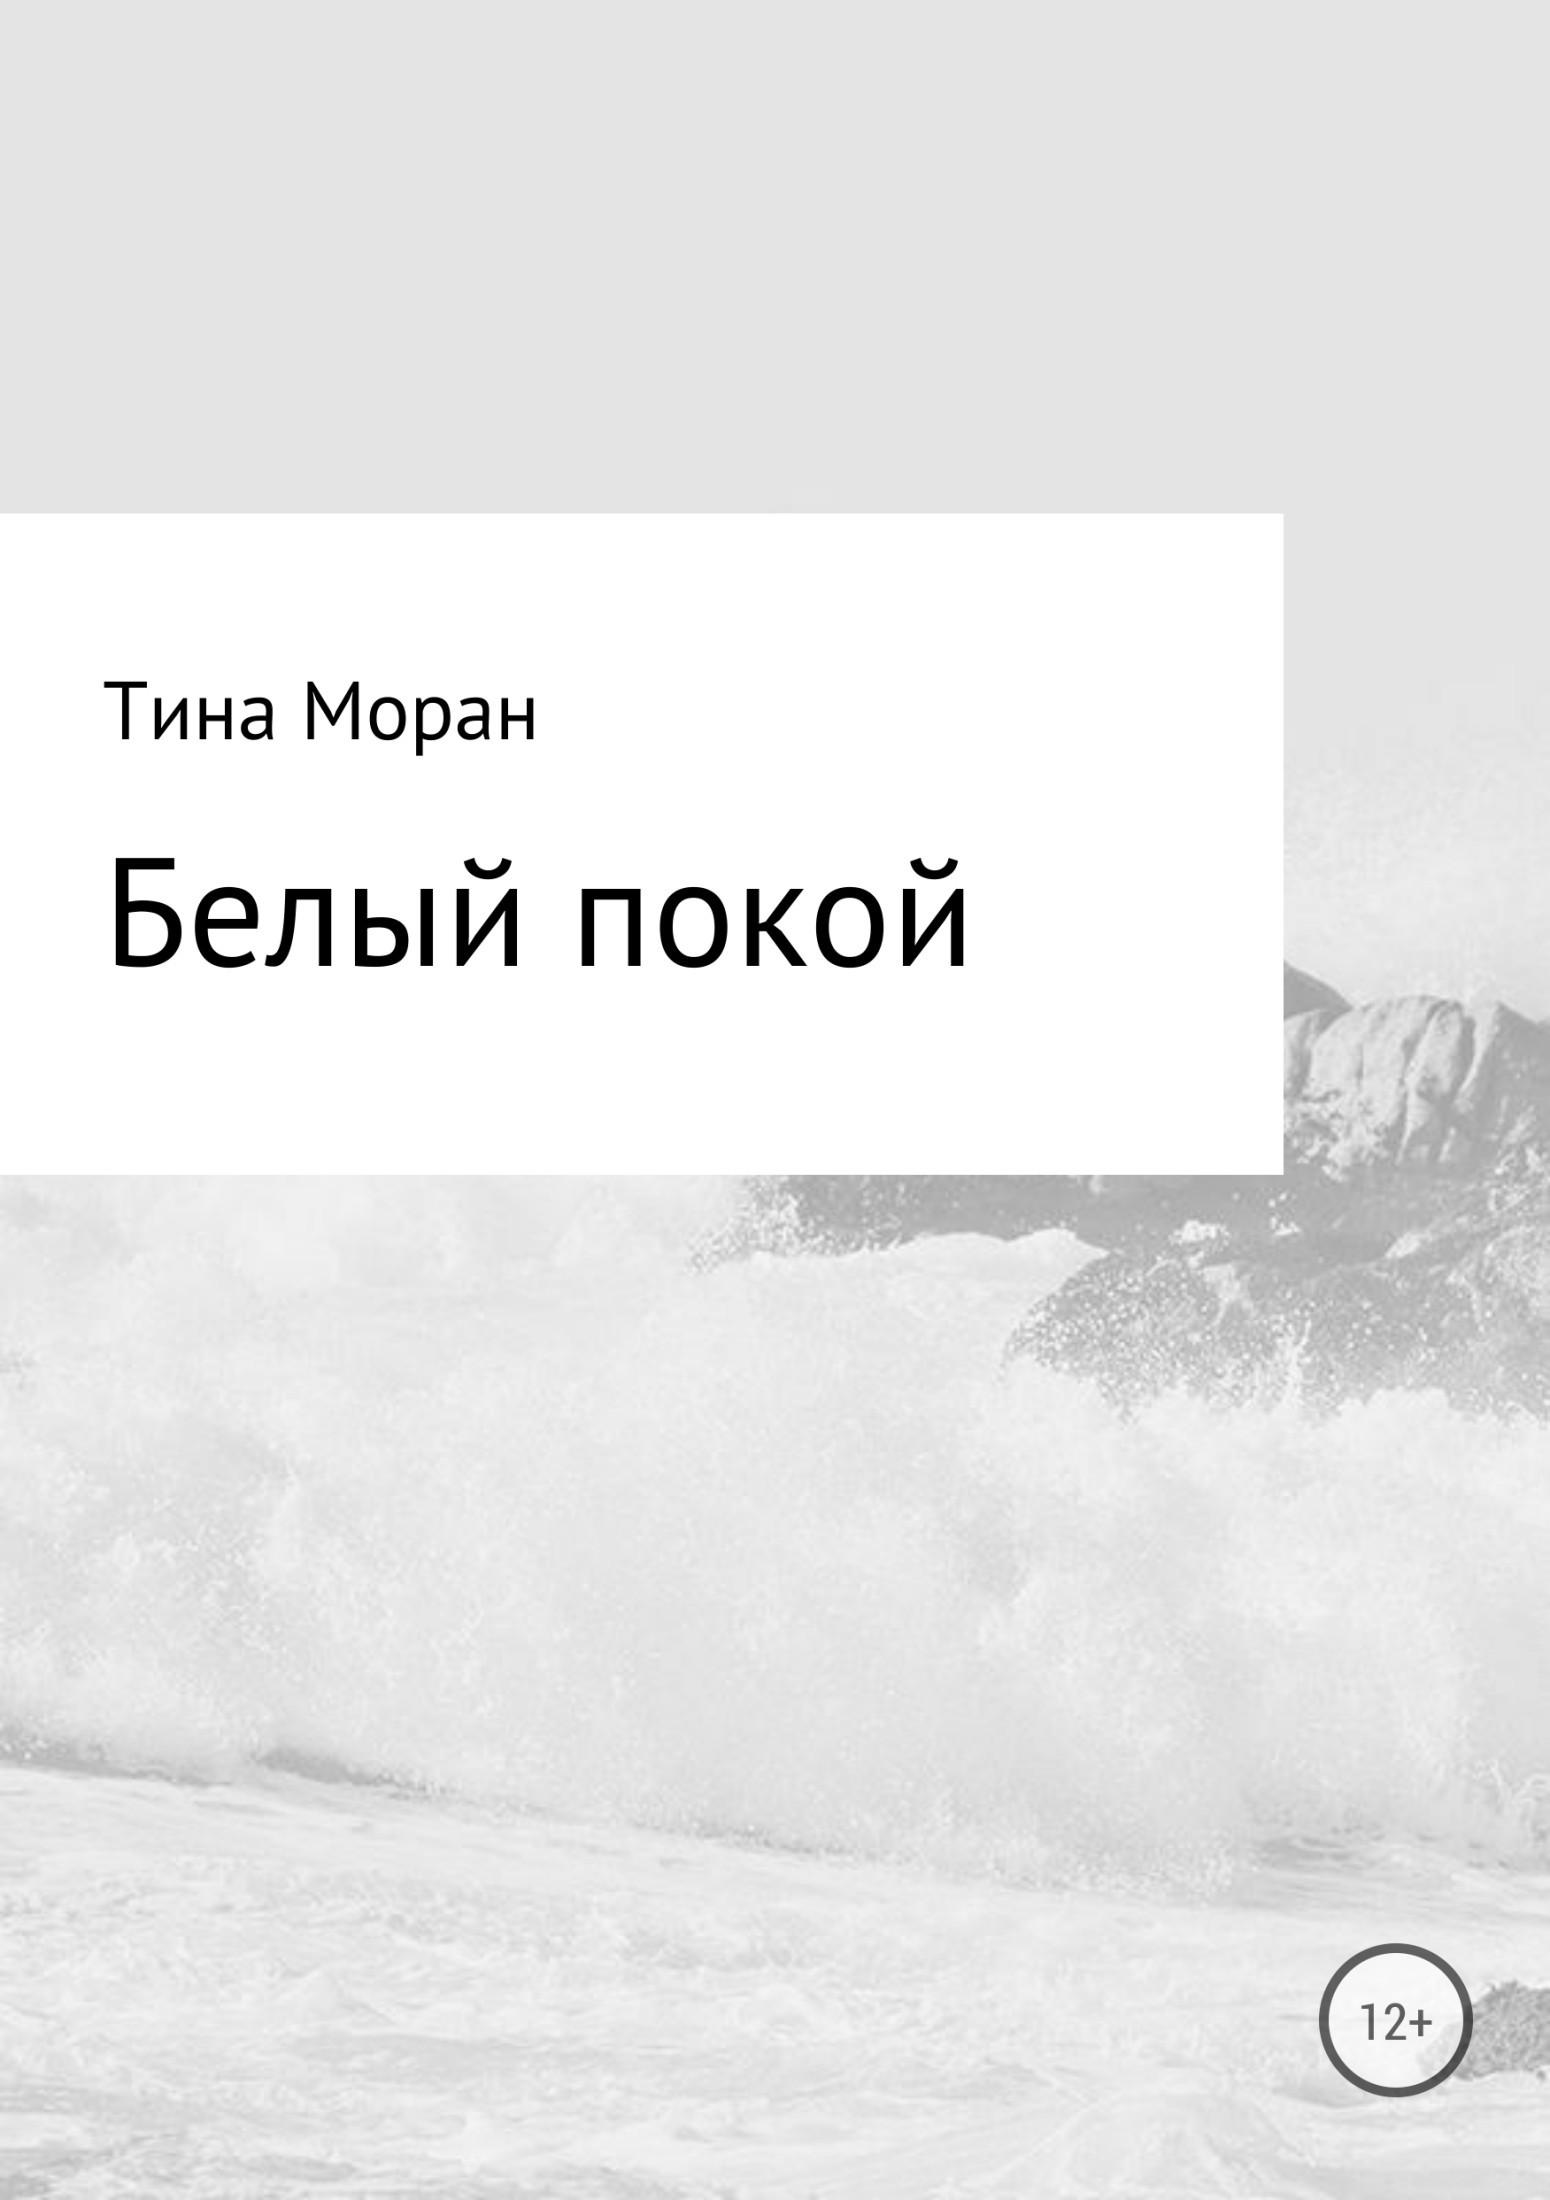 Тина Моран бесплатно